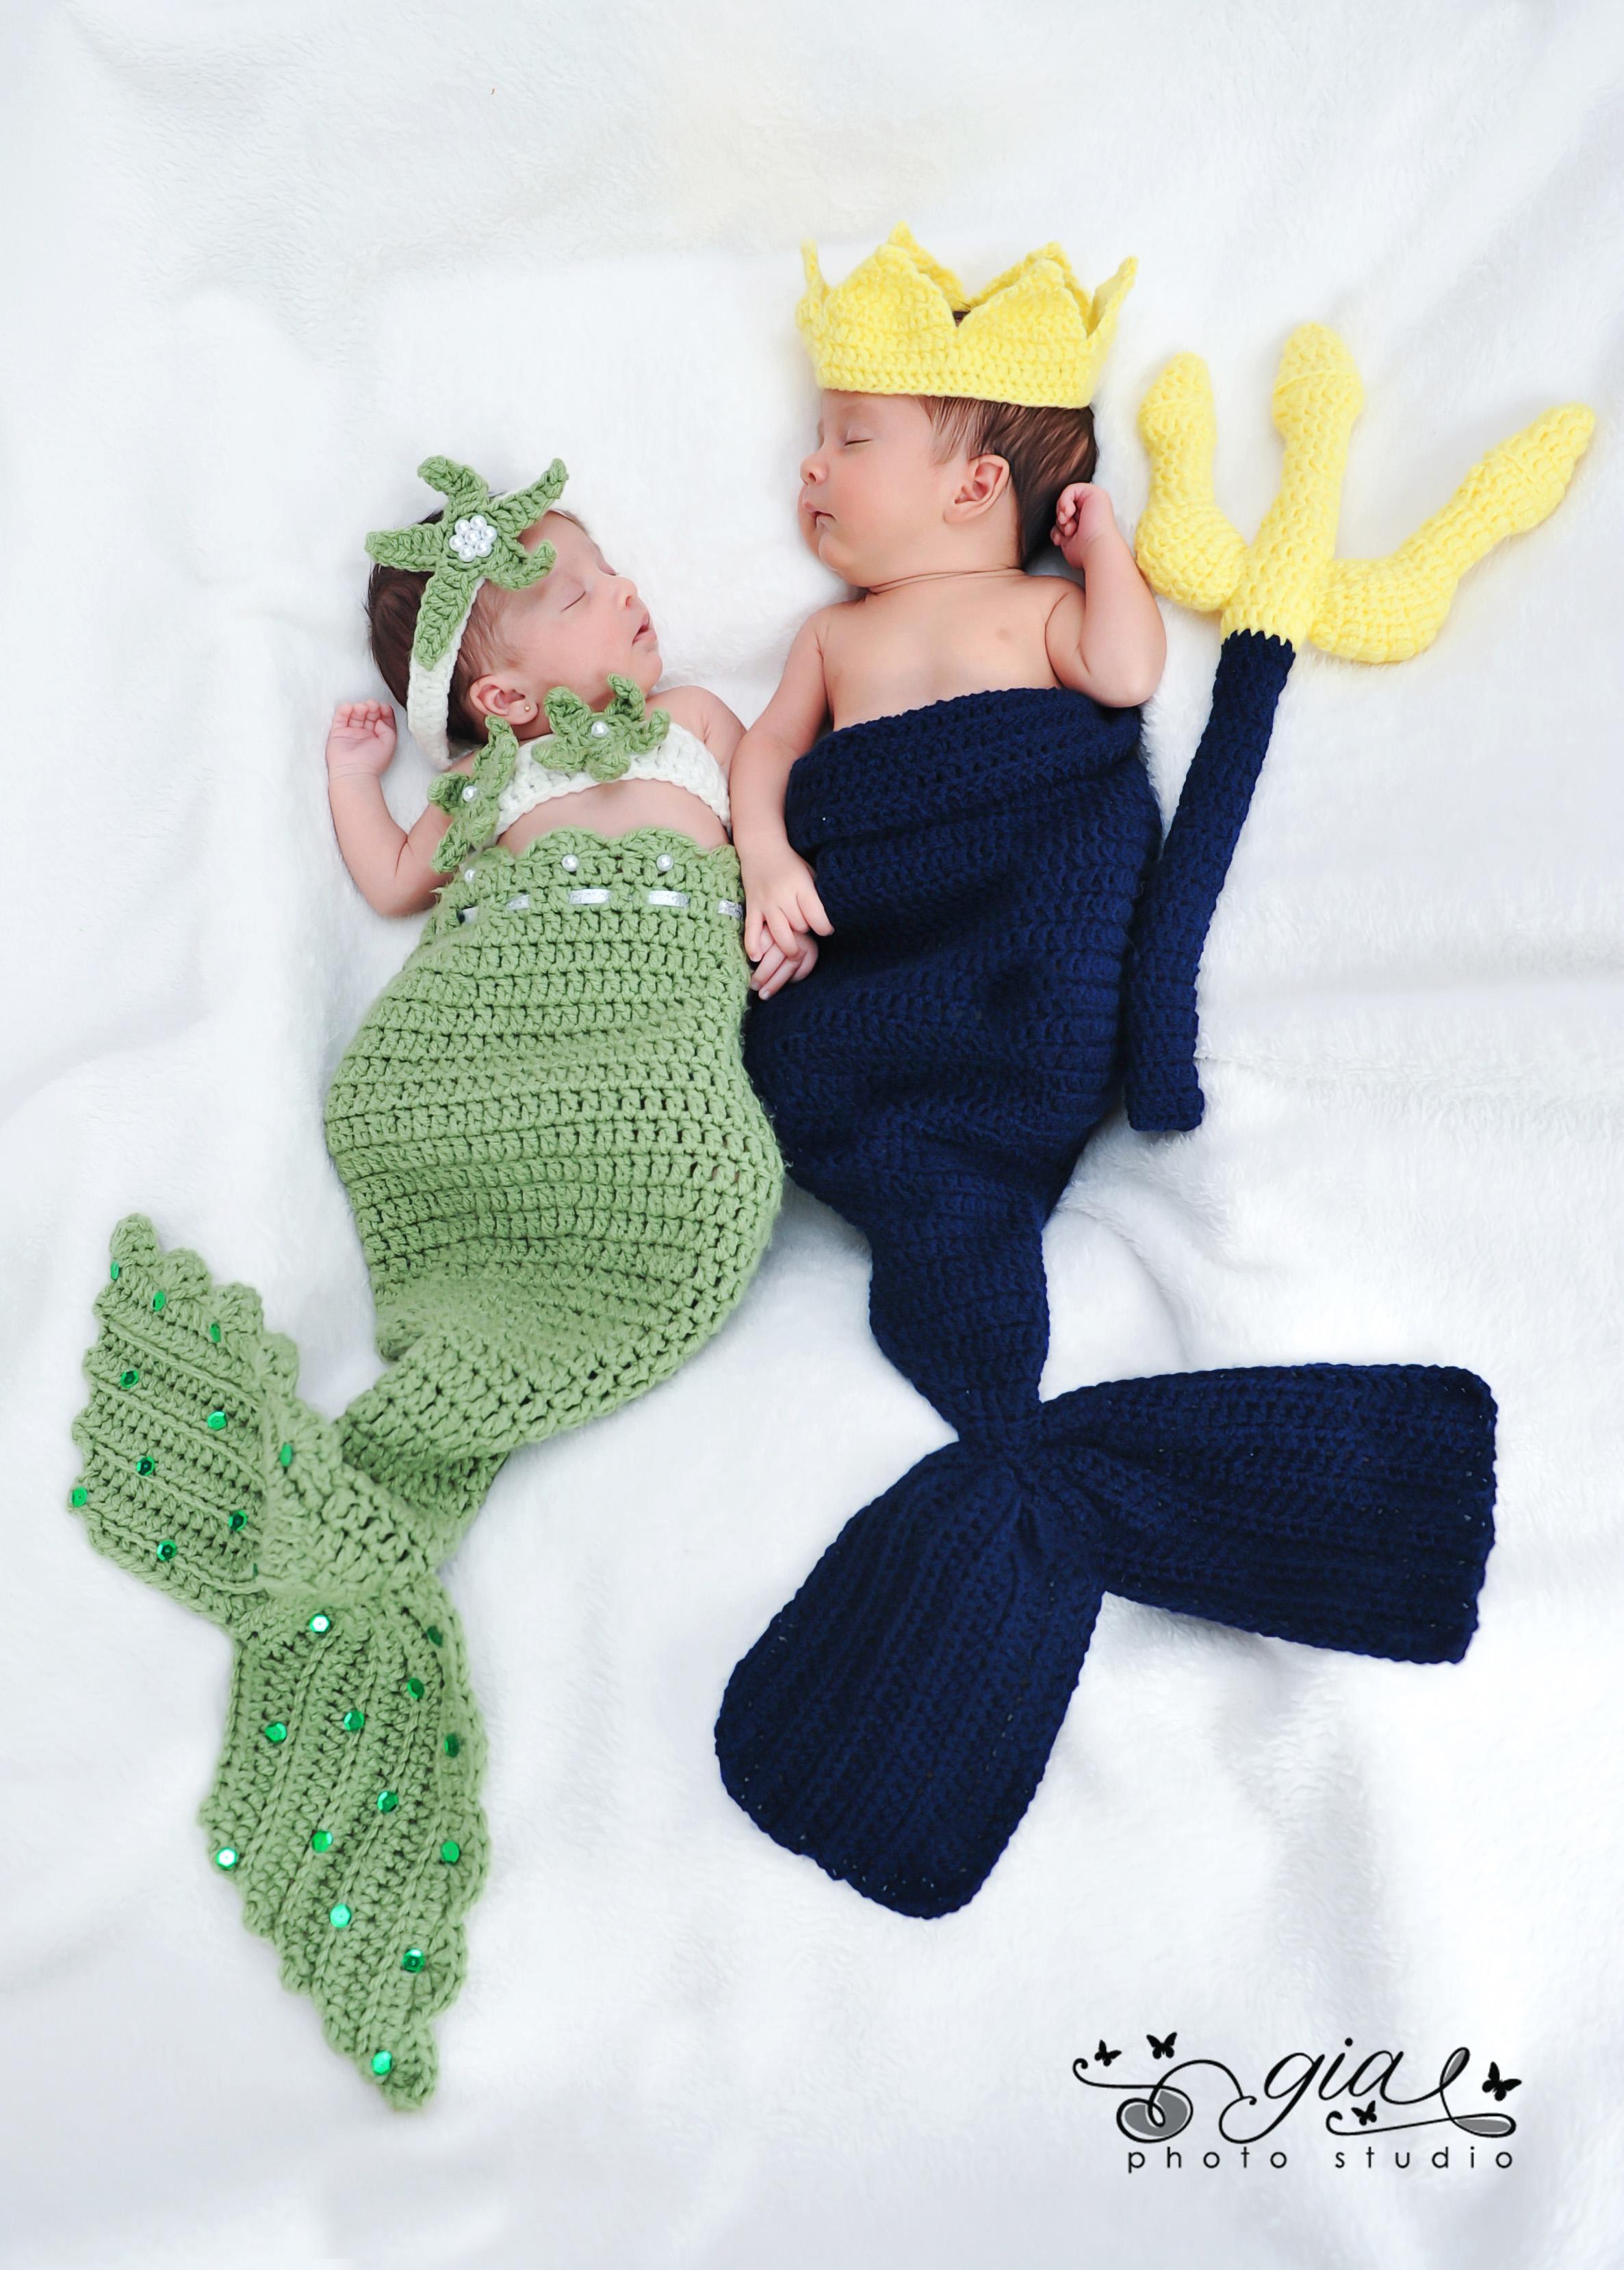 poze-cu-bebelusi-nou-nascuti-16